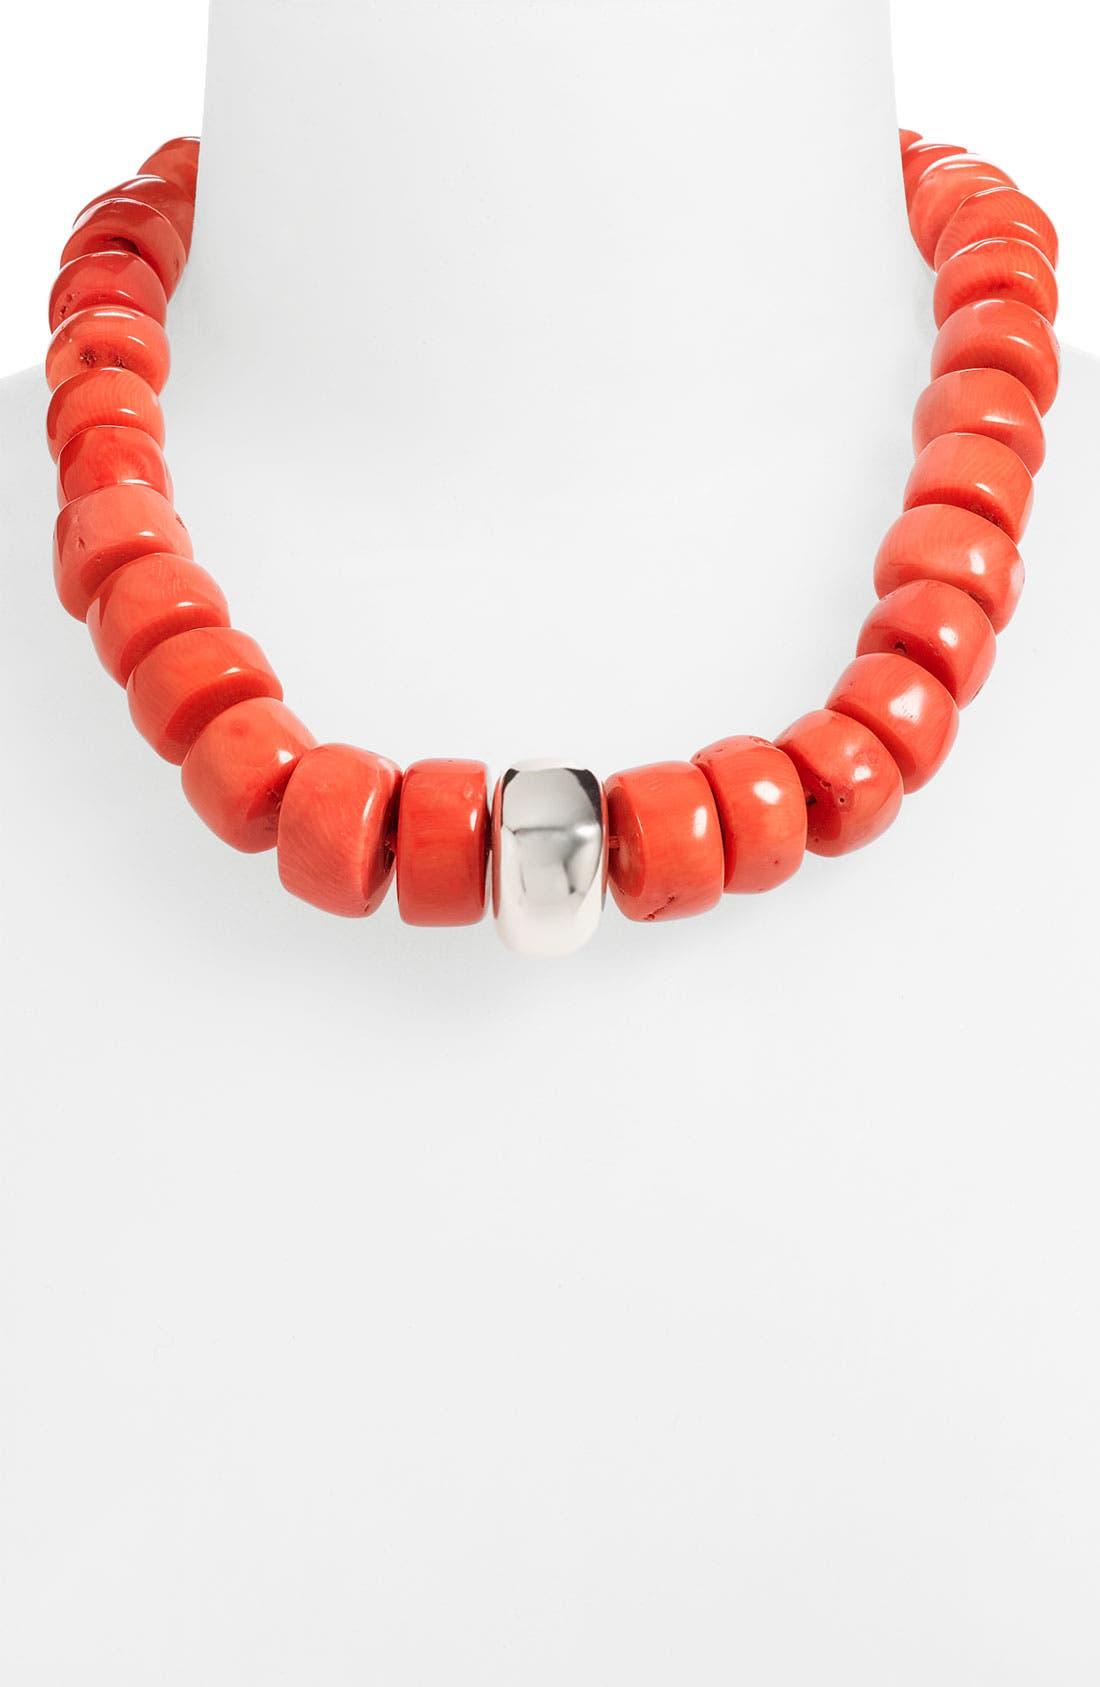 Main Image - Simon Sebbag 'Palm Beach' Coral Bead Necklace